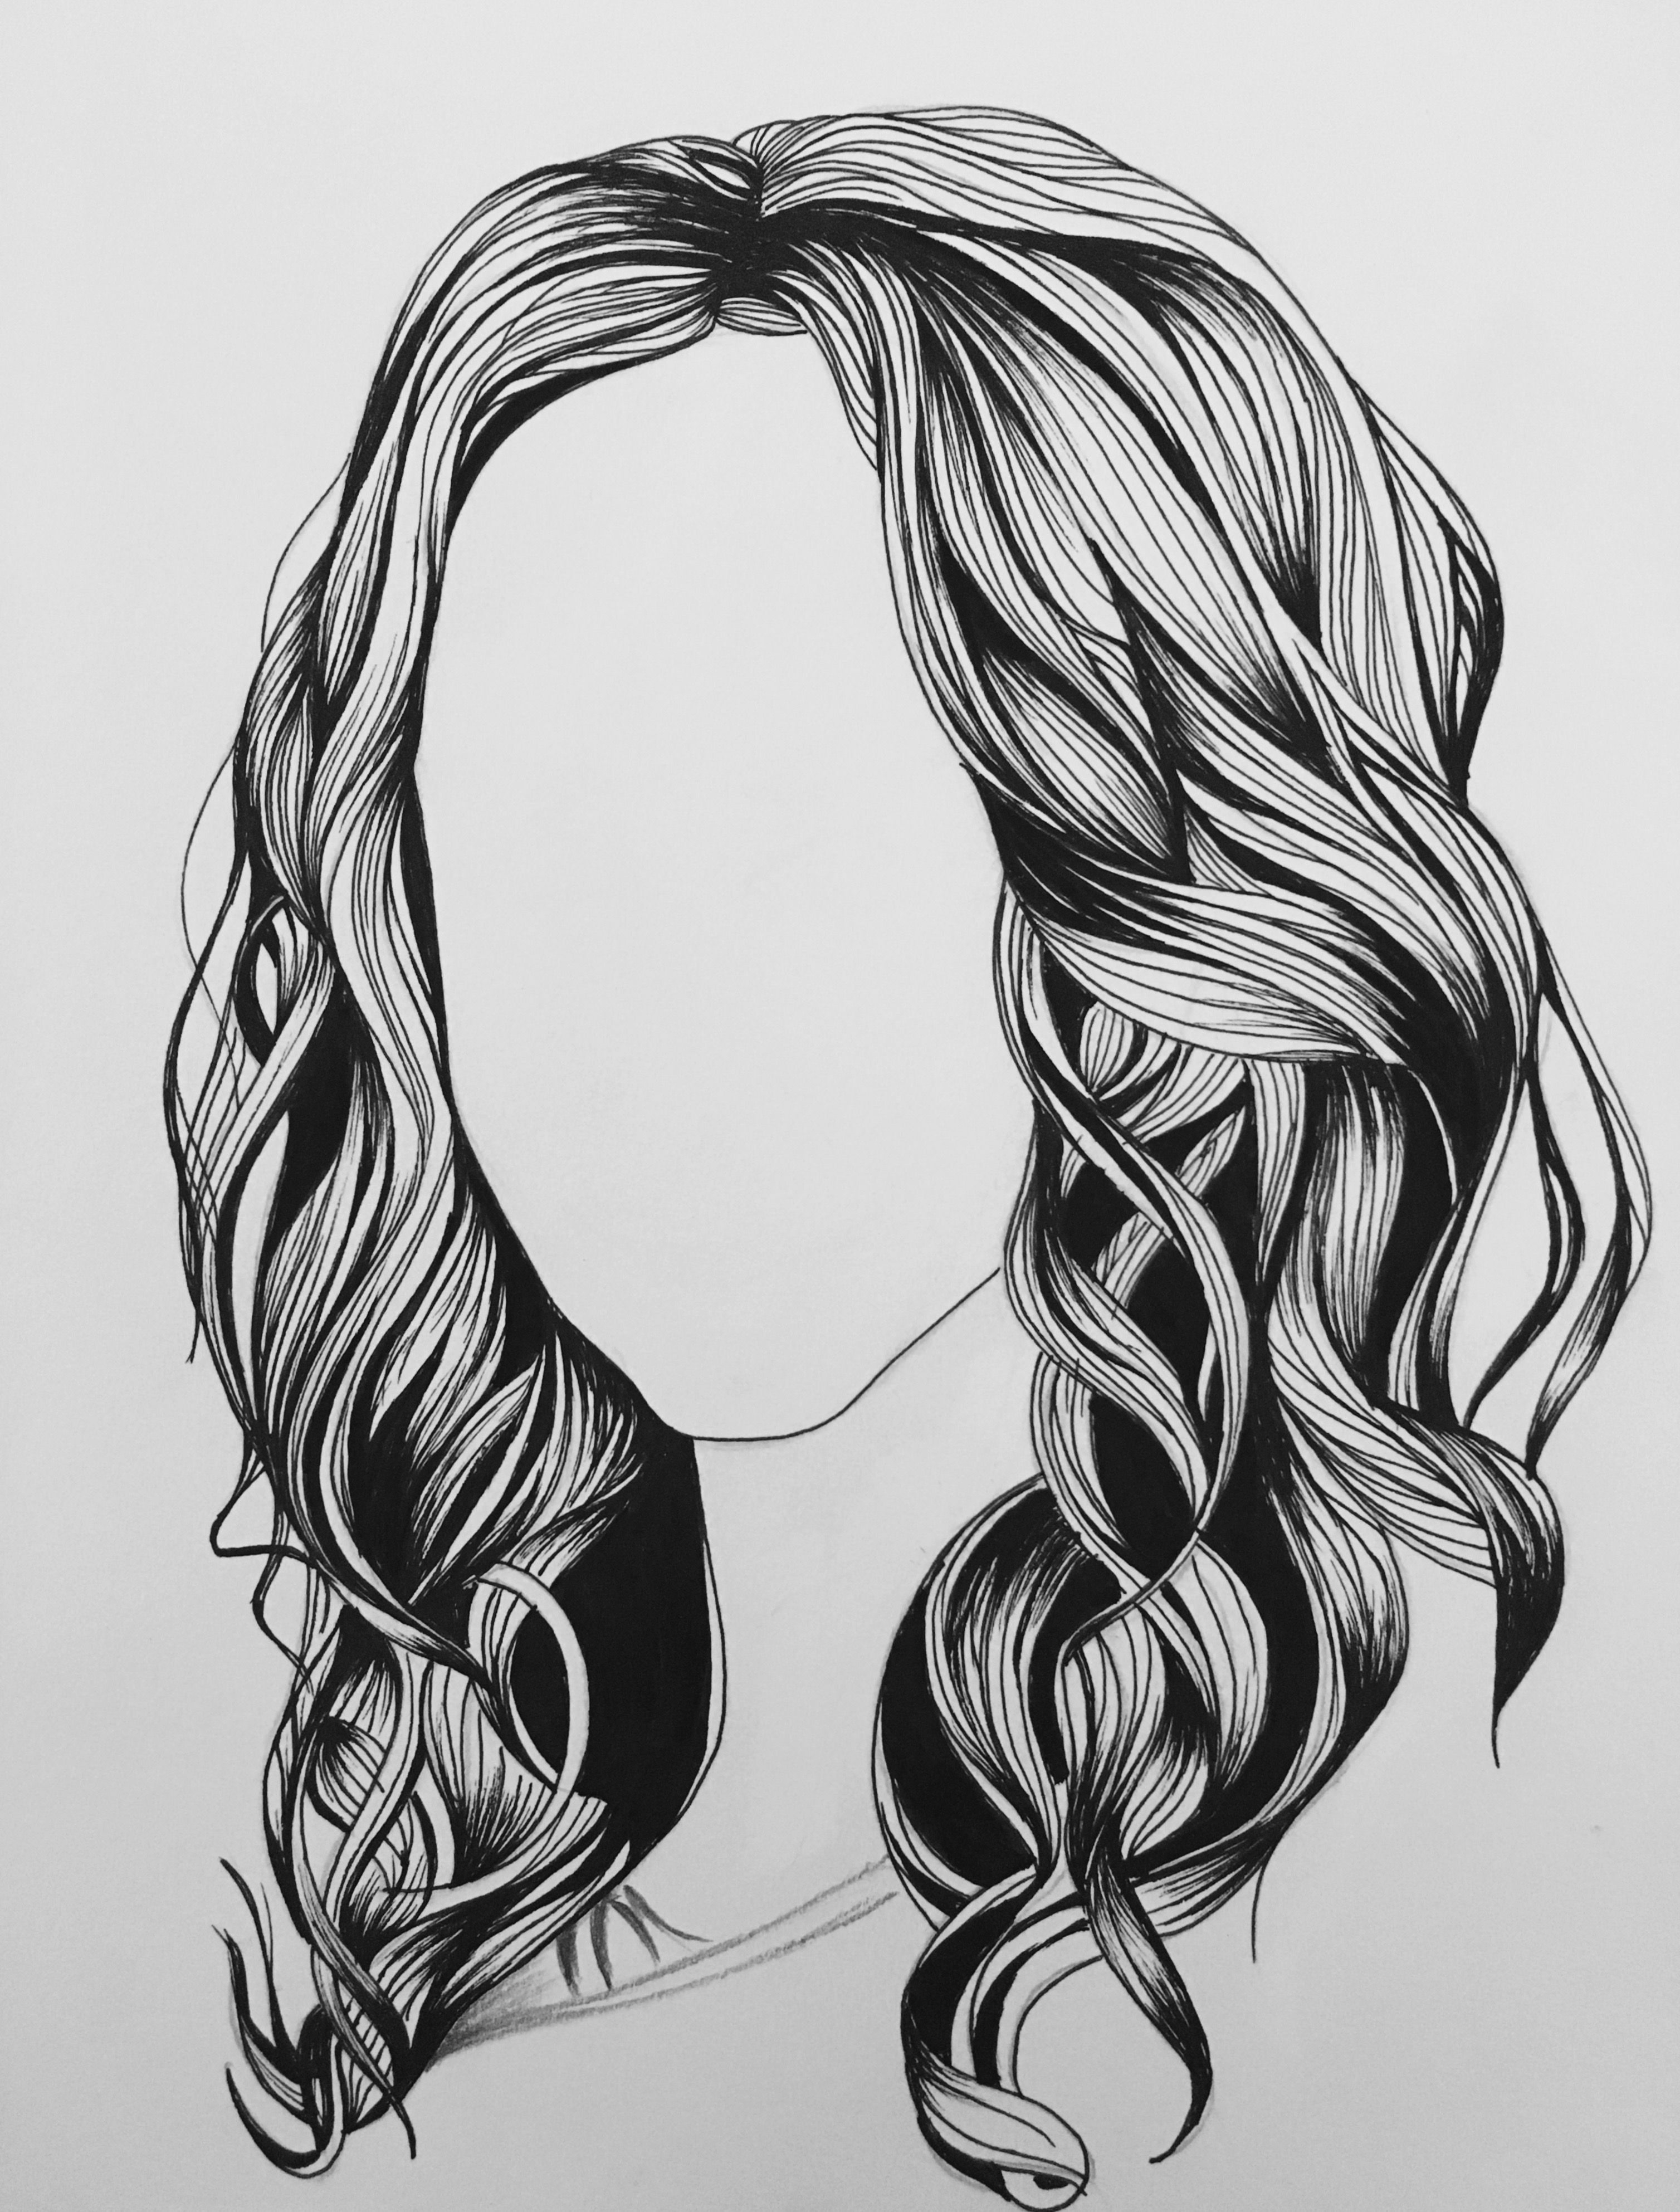 How To Draw Waves Hair : waves, Distinctive, Feminine, Waves, Drawing, Artist, Portfolio,, Hair,, Brush